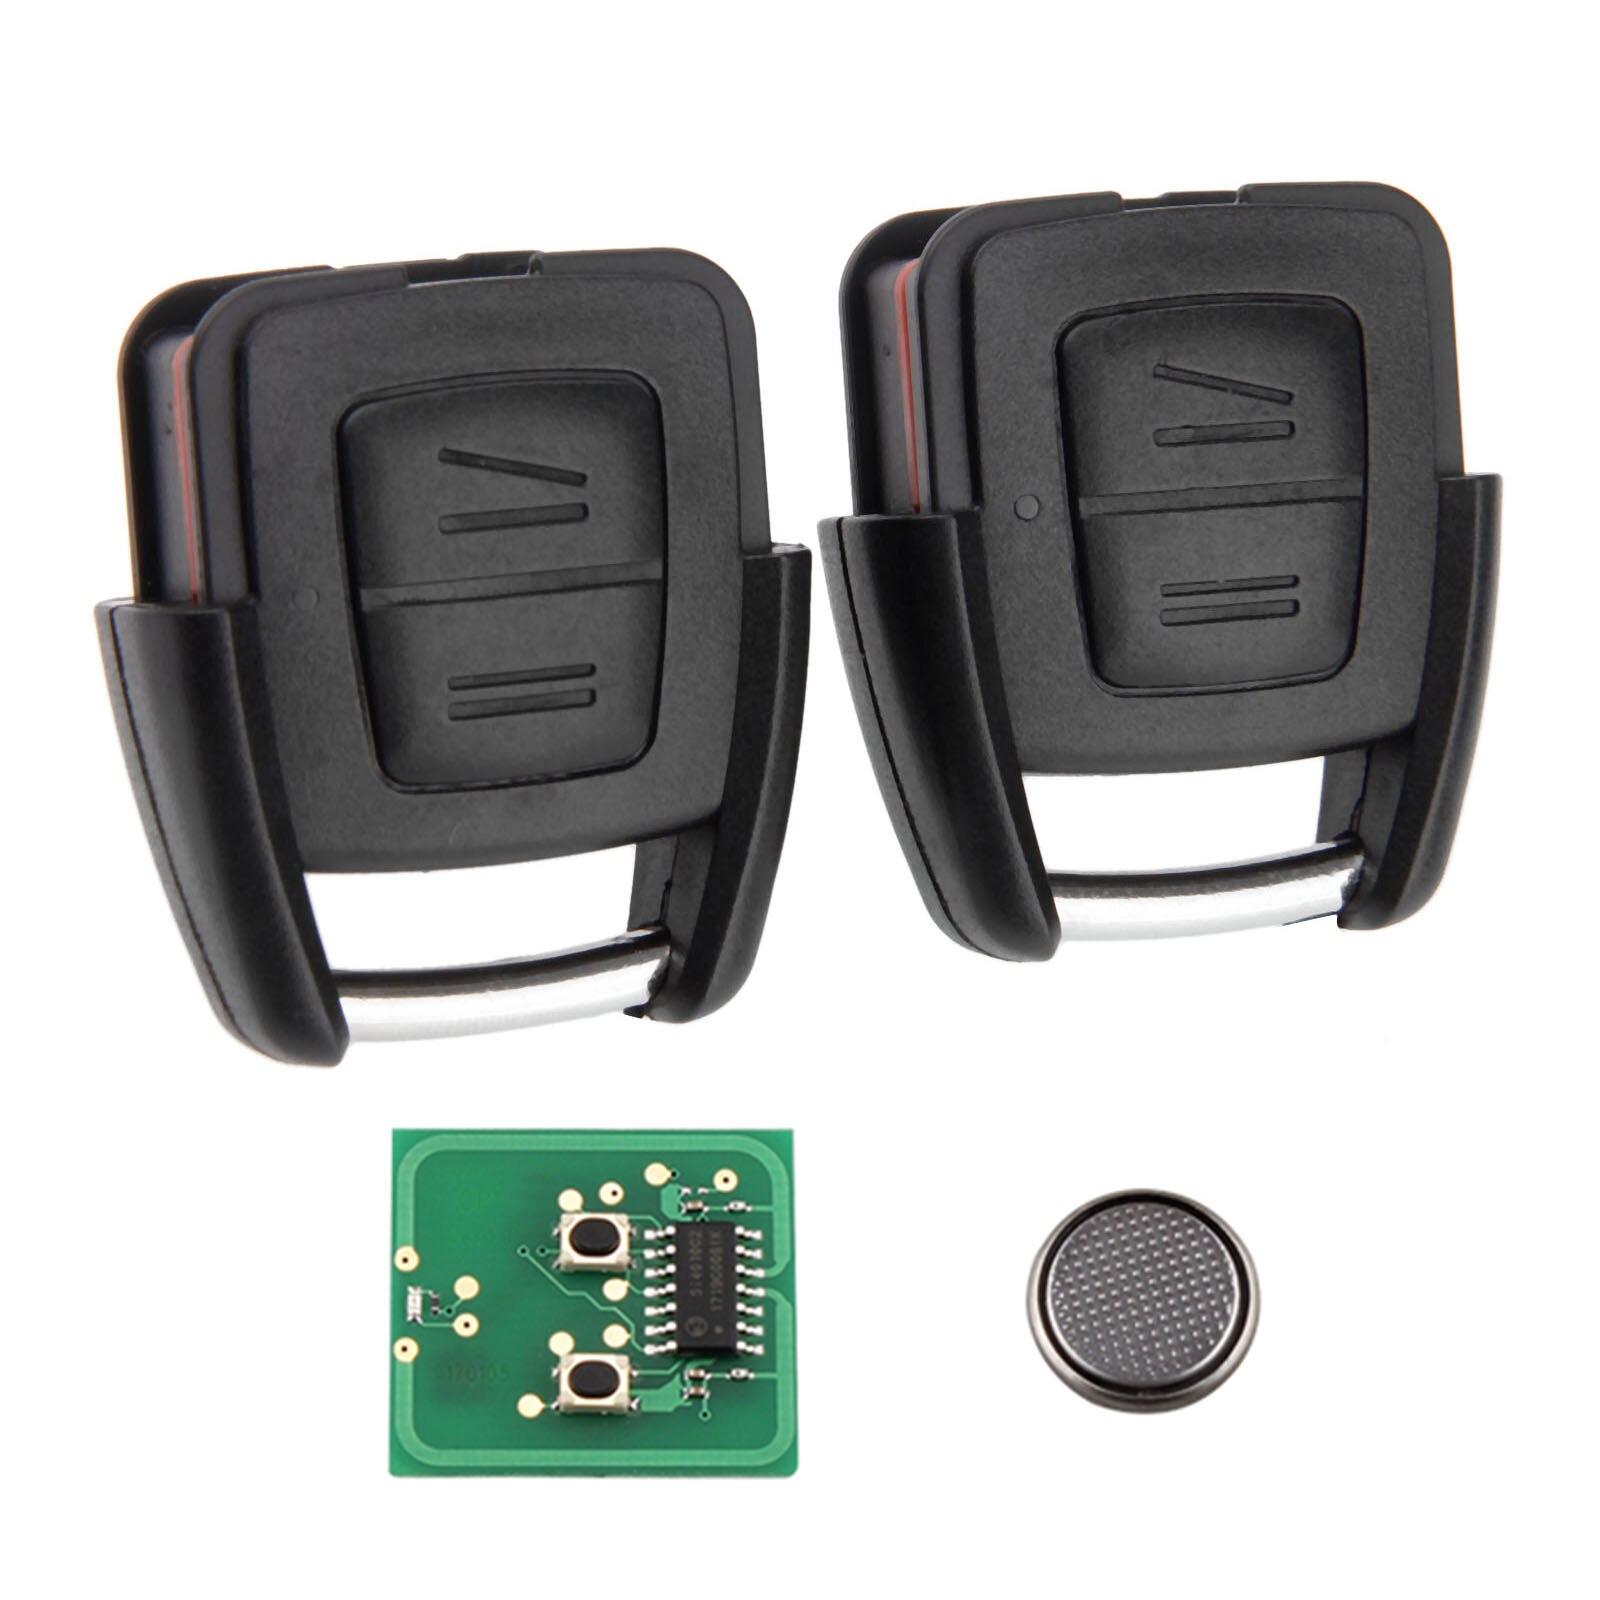 Mando a distancia inteligente para coche Yetaha 2 uds para Vauxhall Opel Astra Zafira Frontera Omega Vectra K24116 433 MHz 2 botones Remtekey